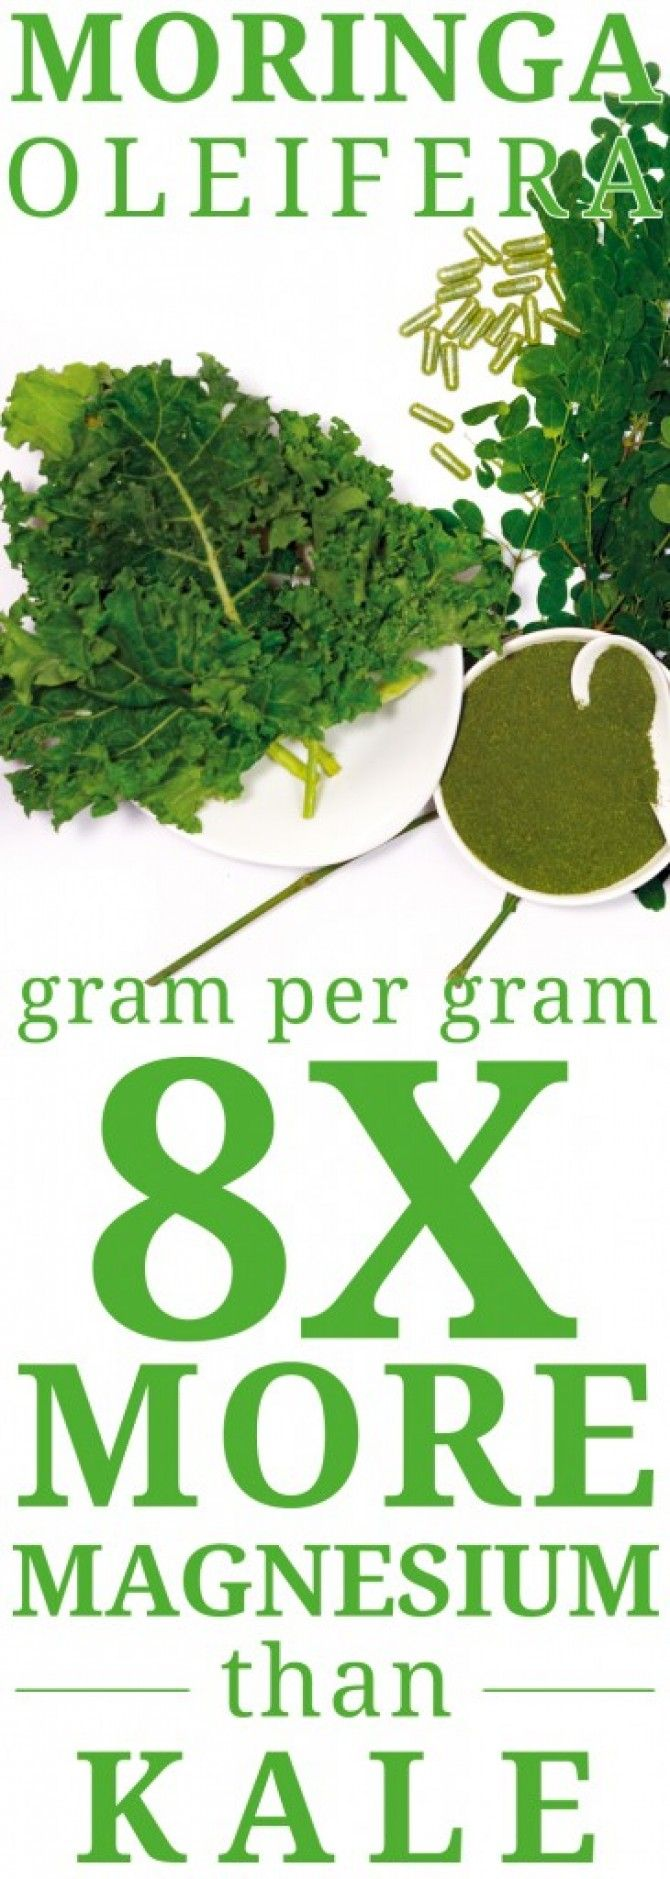 Moringa Oleifera has 8 times More Magnesium than Kale